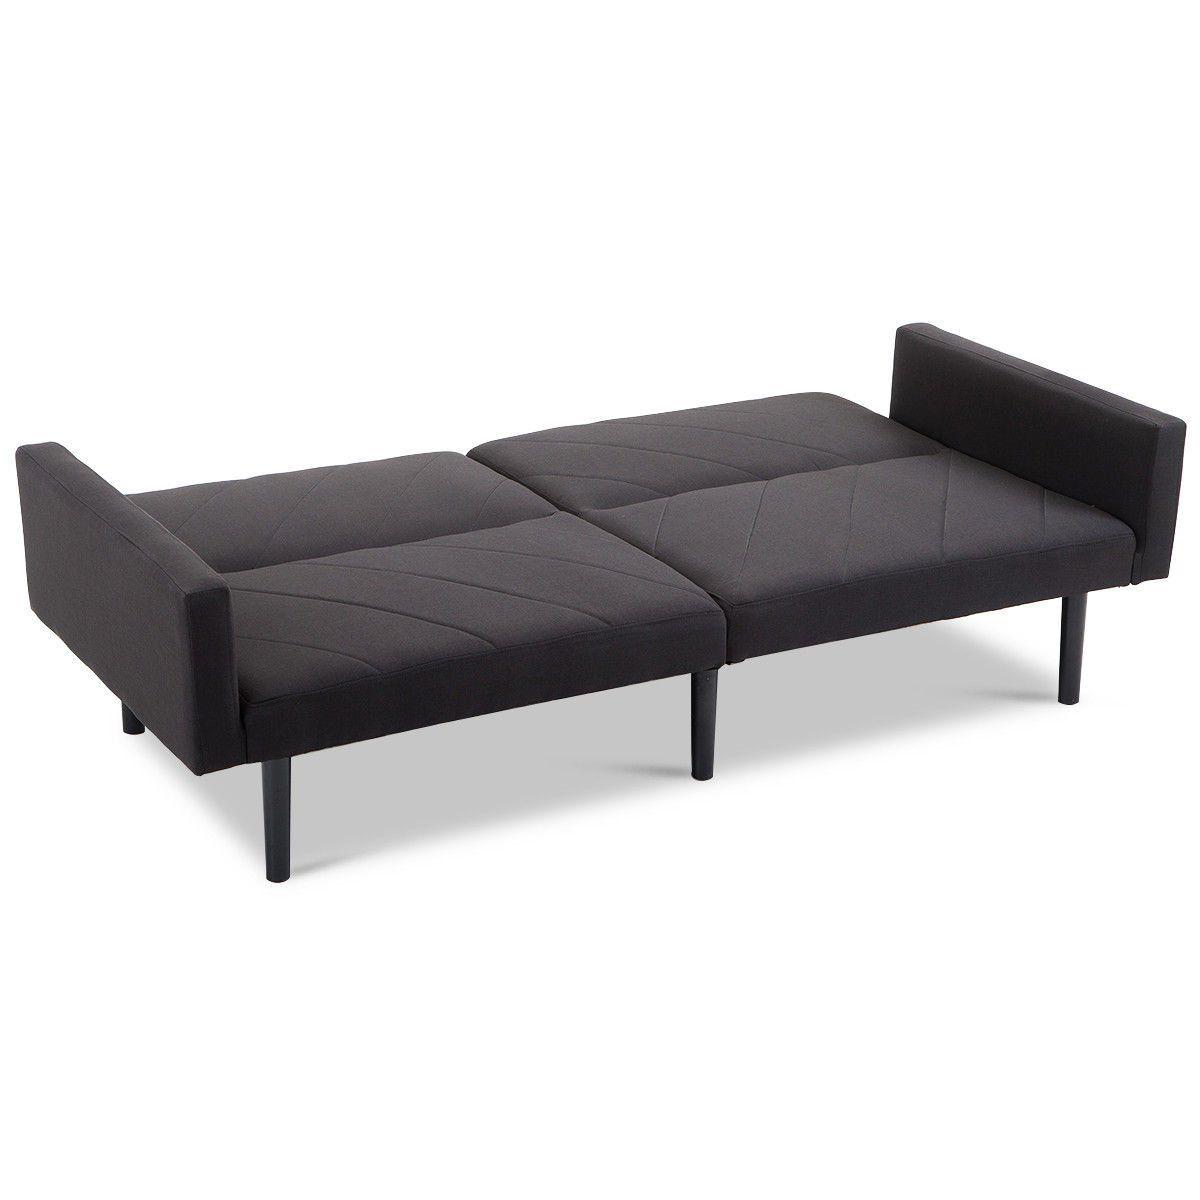 Black Convertible Linen Futon Sofa Bed Couch Wood Legs Split Backrest Recliner Lounger Splitback Sleeper 5 Reclining Ang Sofa Bed Black Futon Sofa Bed Sofa Bed